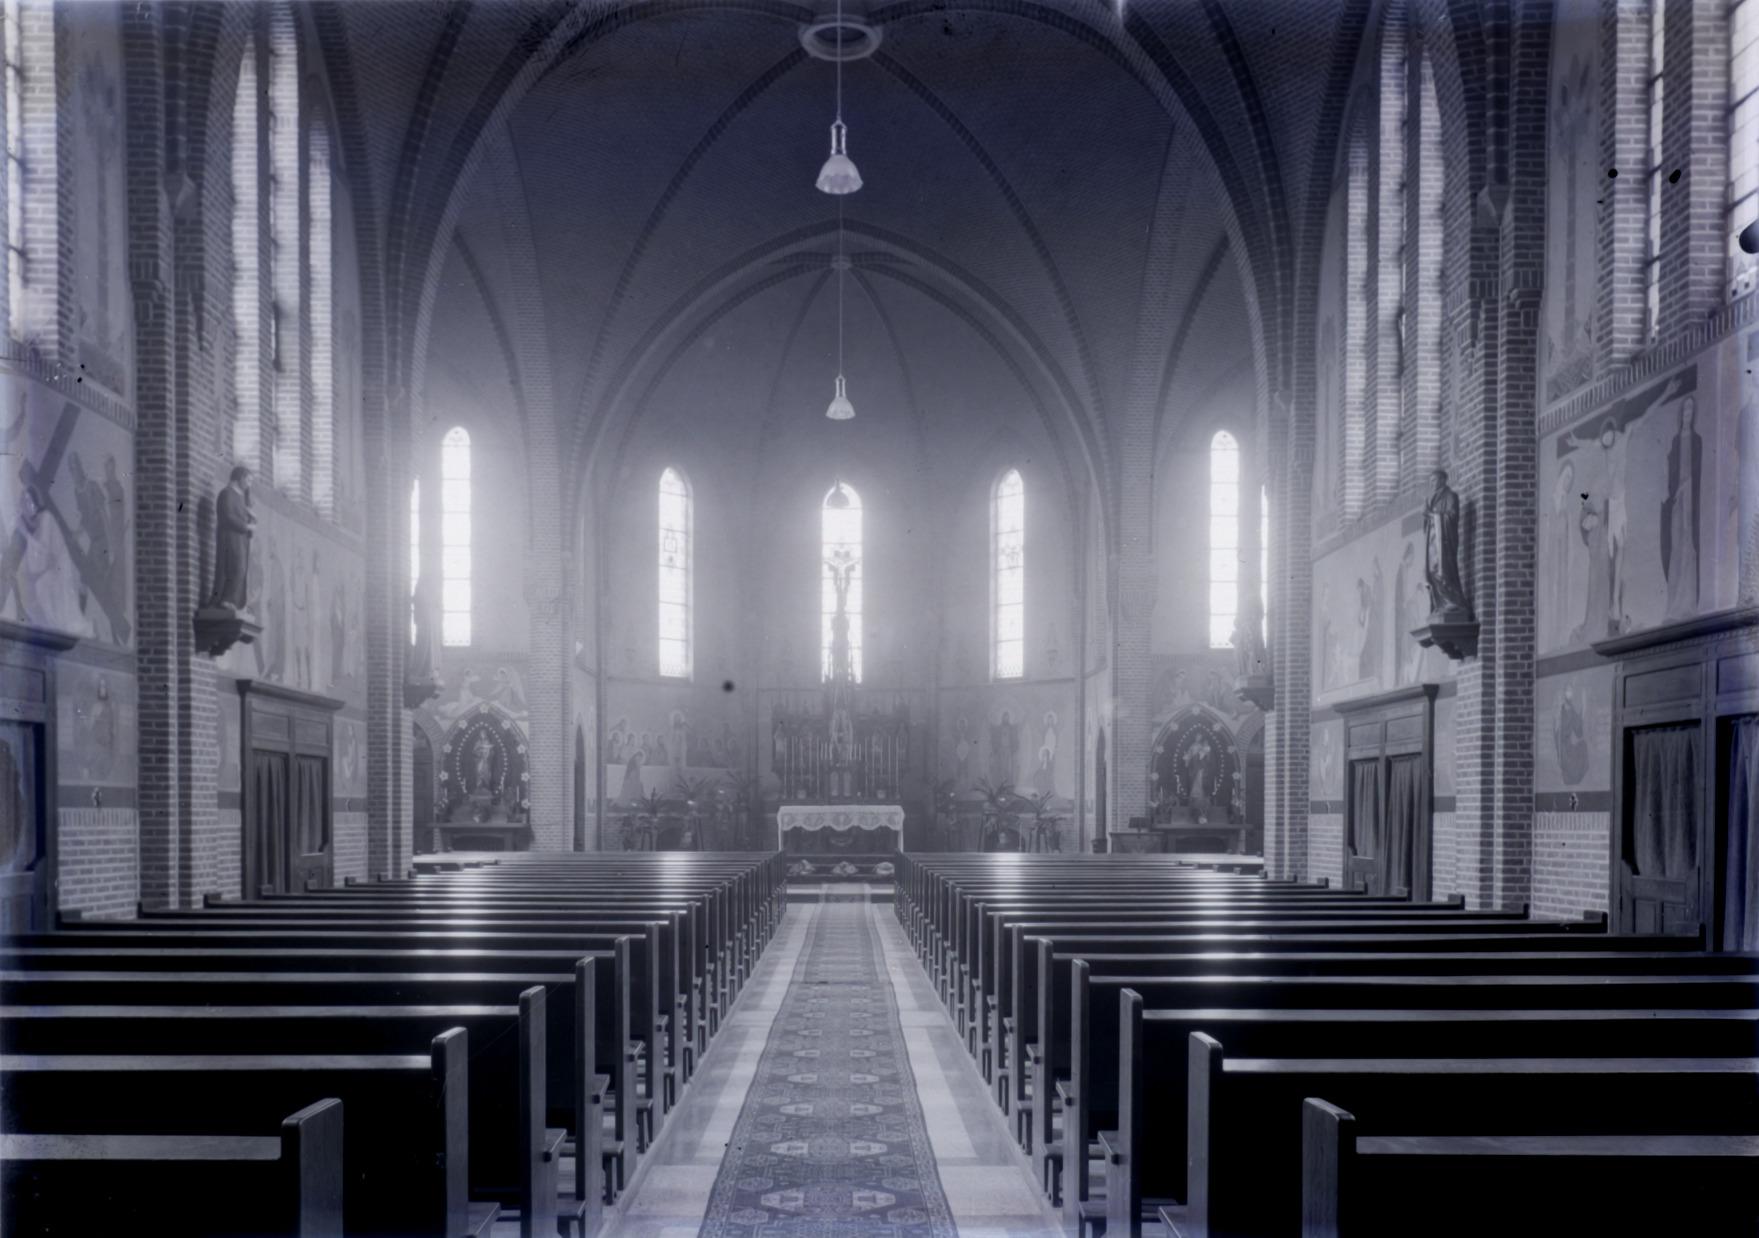 klooster kapel kloosterkapel kerk juvenaat altaar